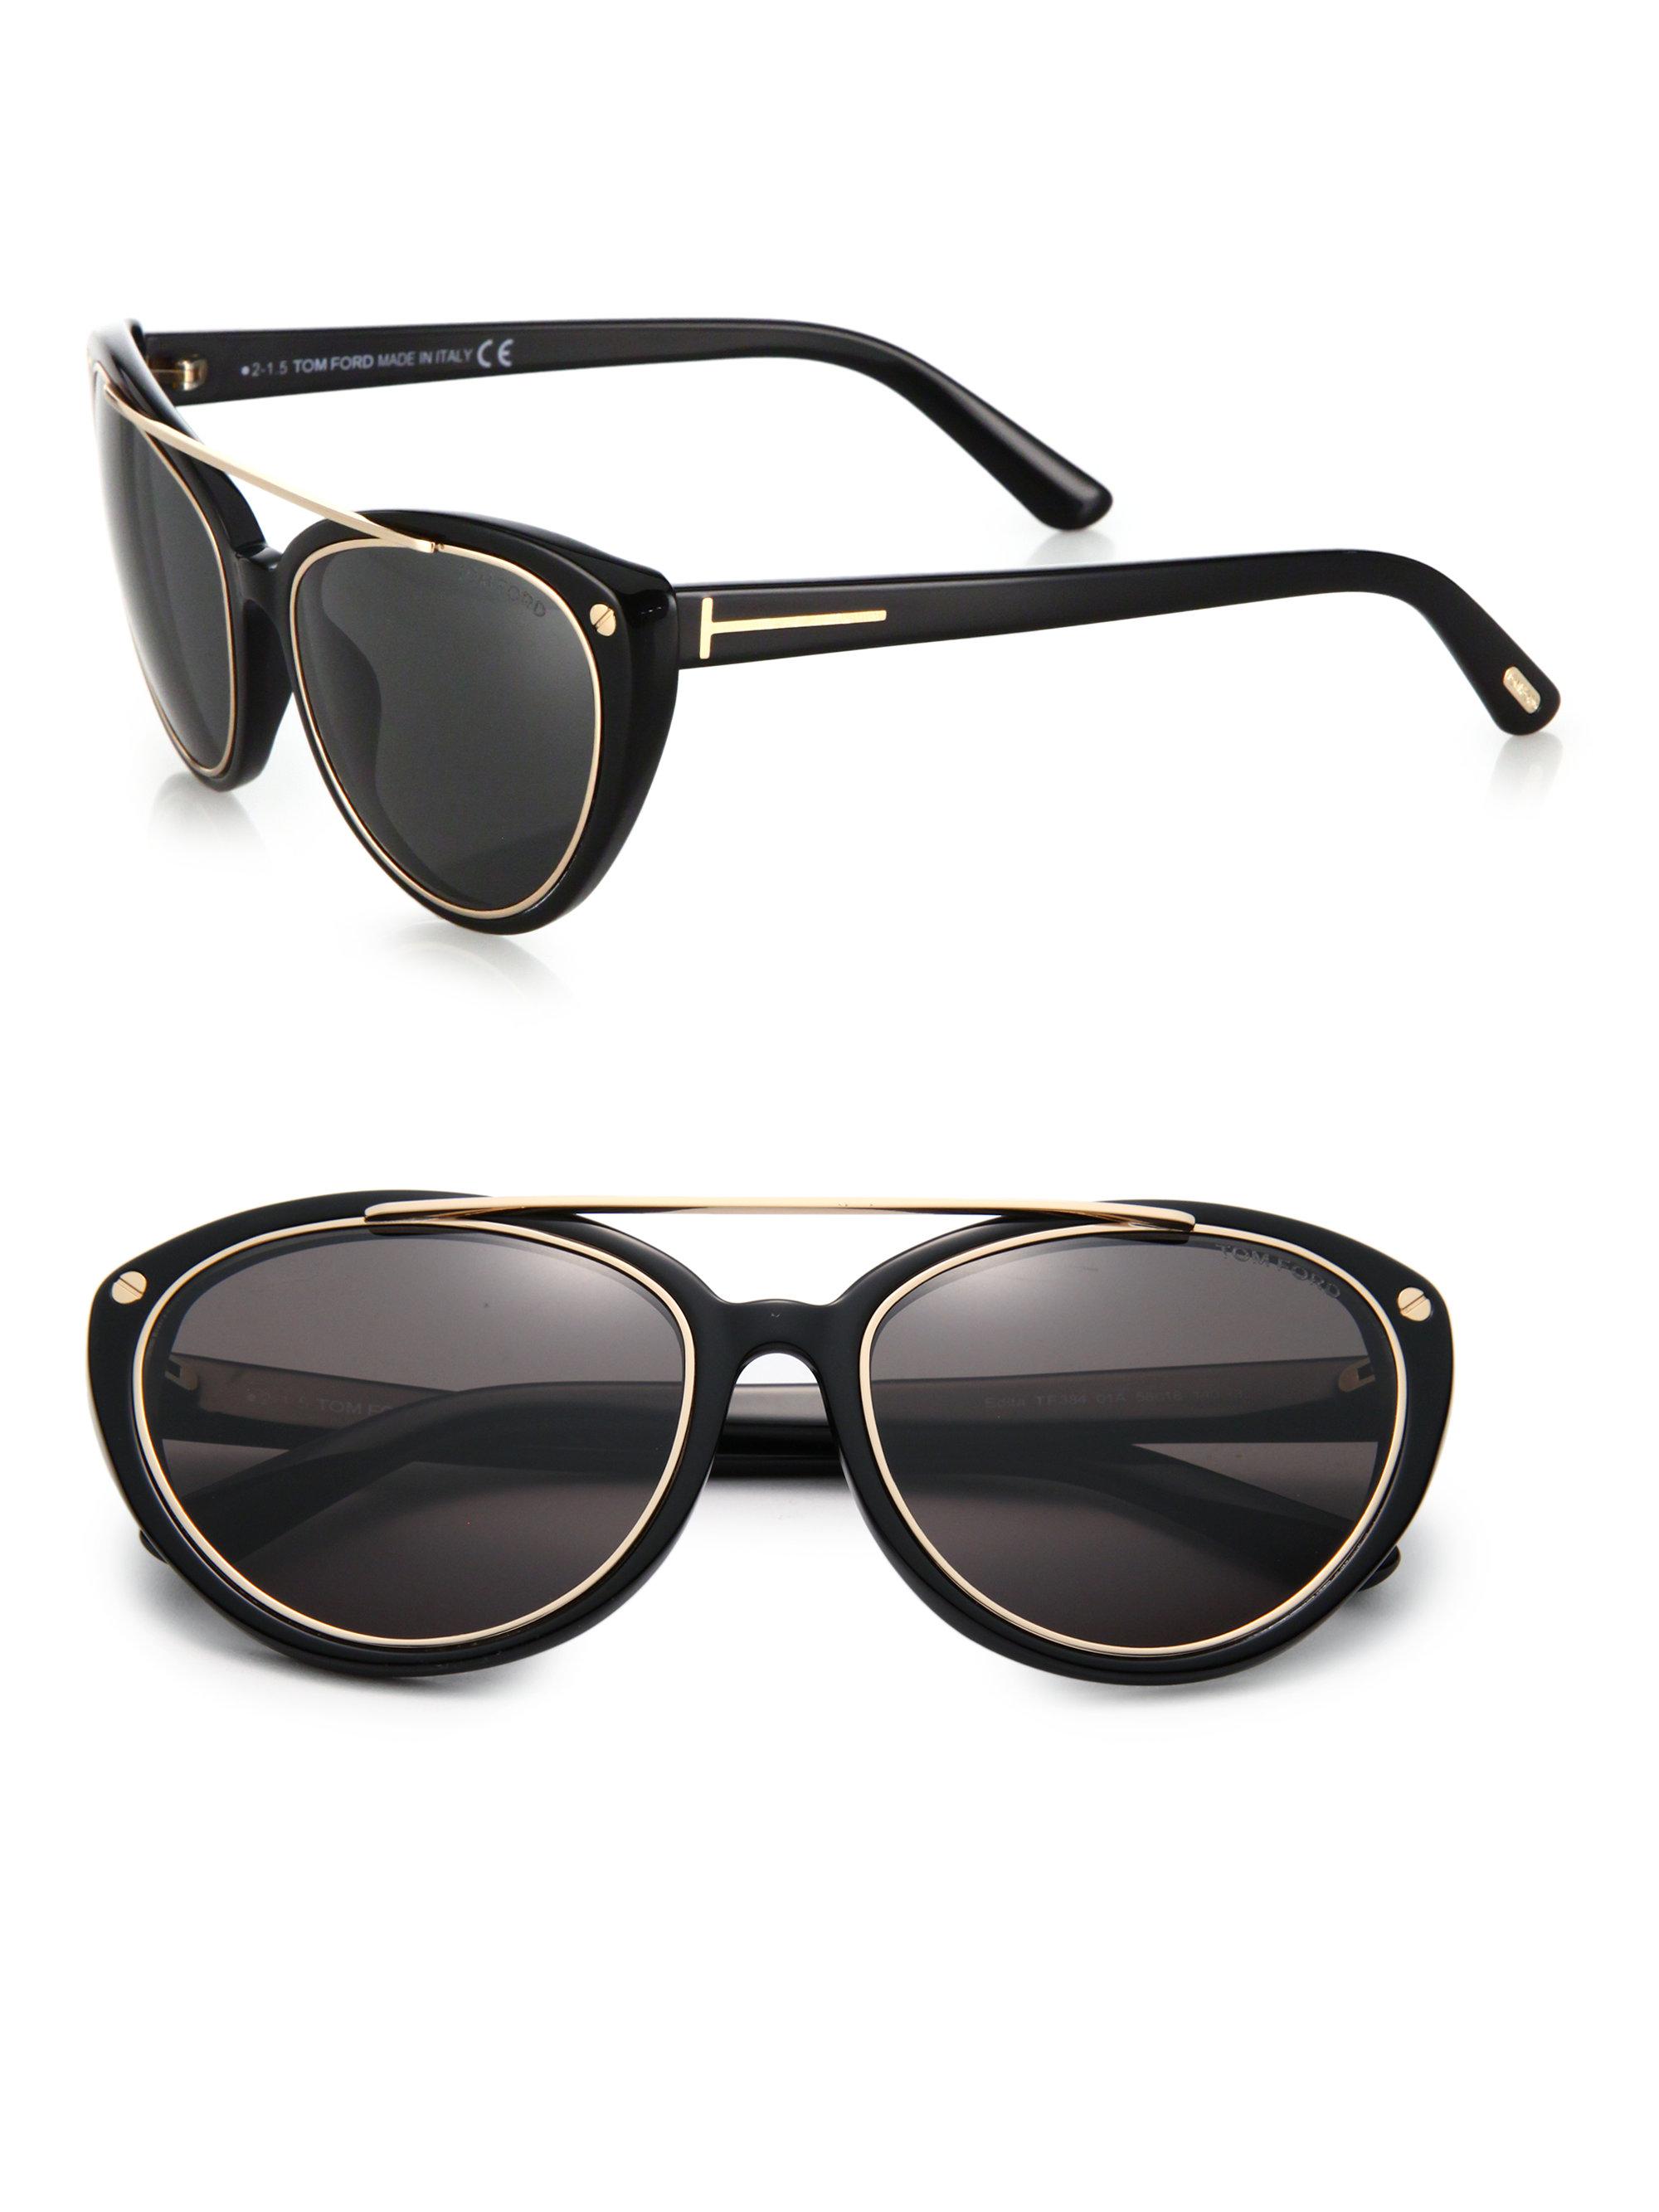 Tom Ford Gold Cat Eye Sunglasses